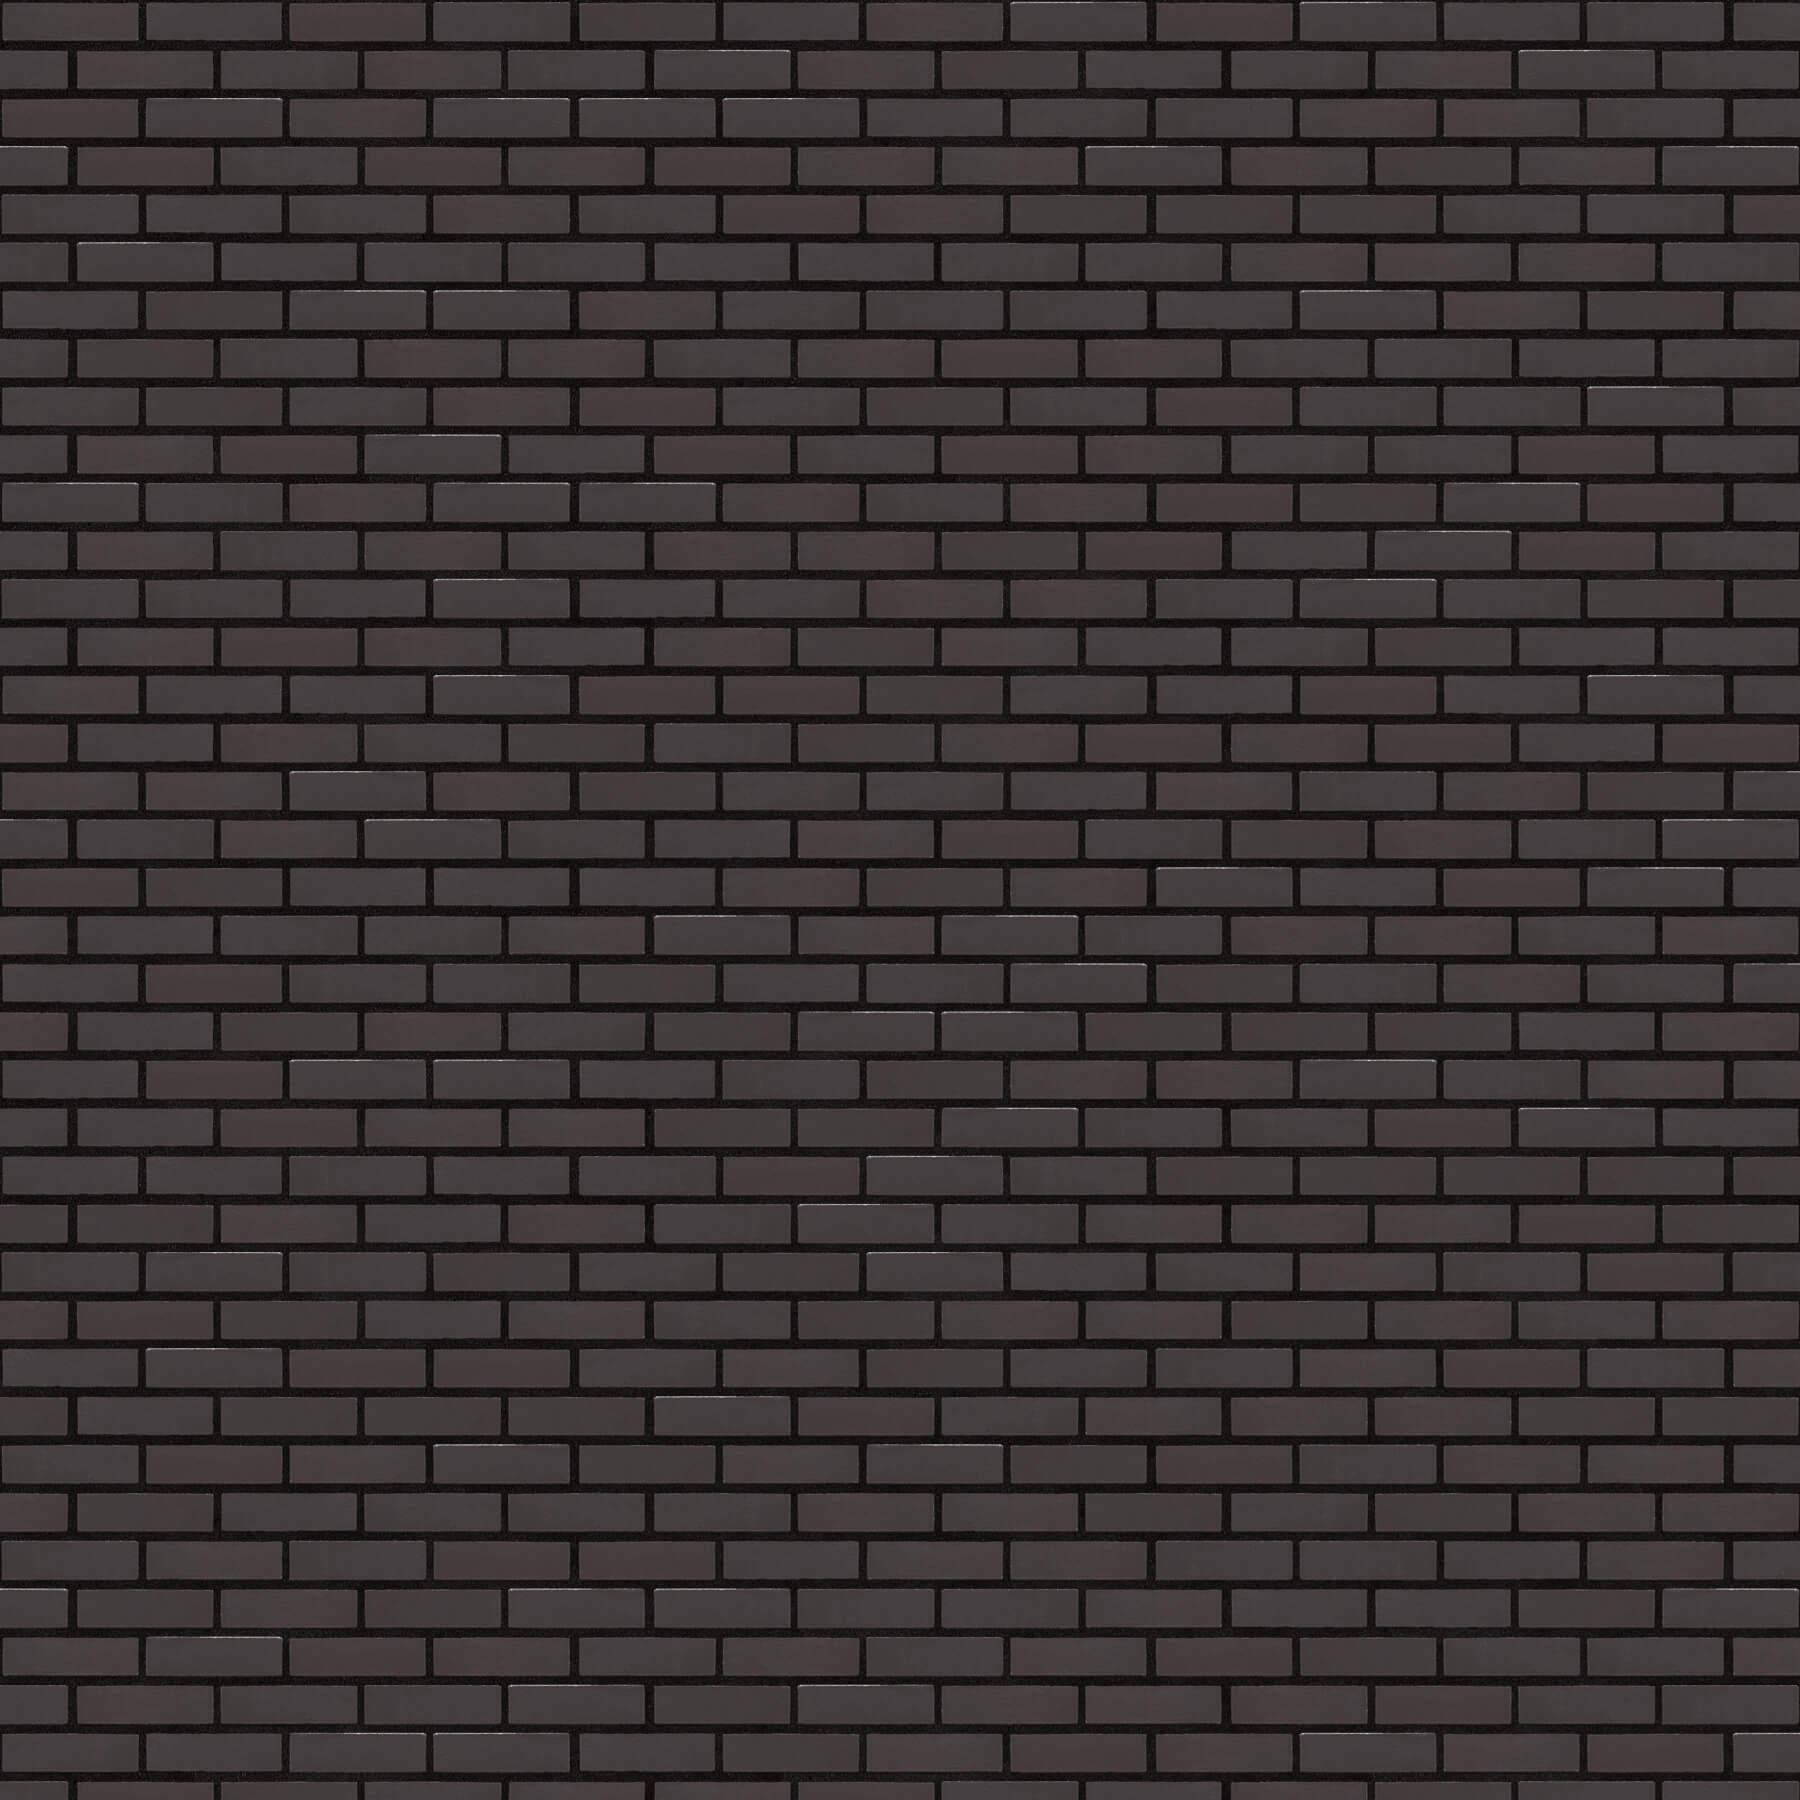 Dekorativna cigla listela FeldHaus Klinker r-700 nf Antracit Fuga